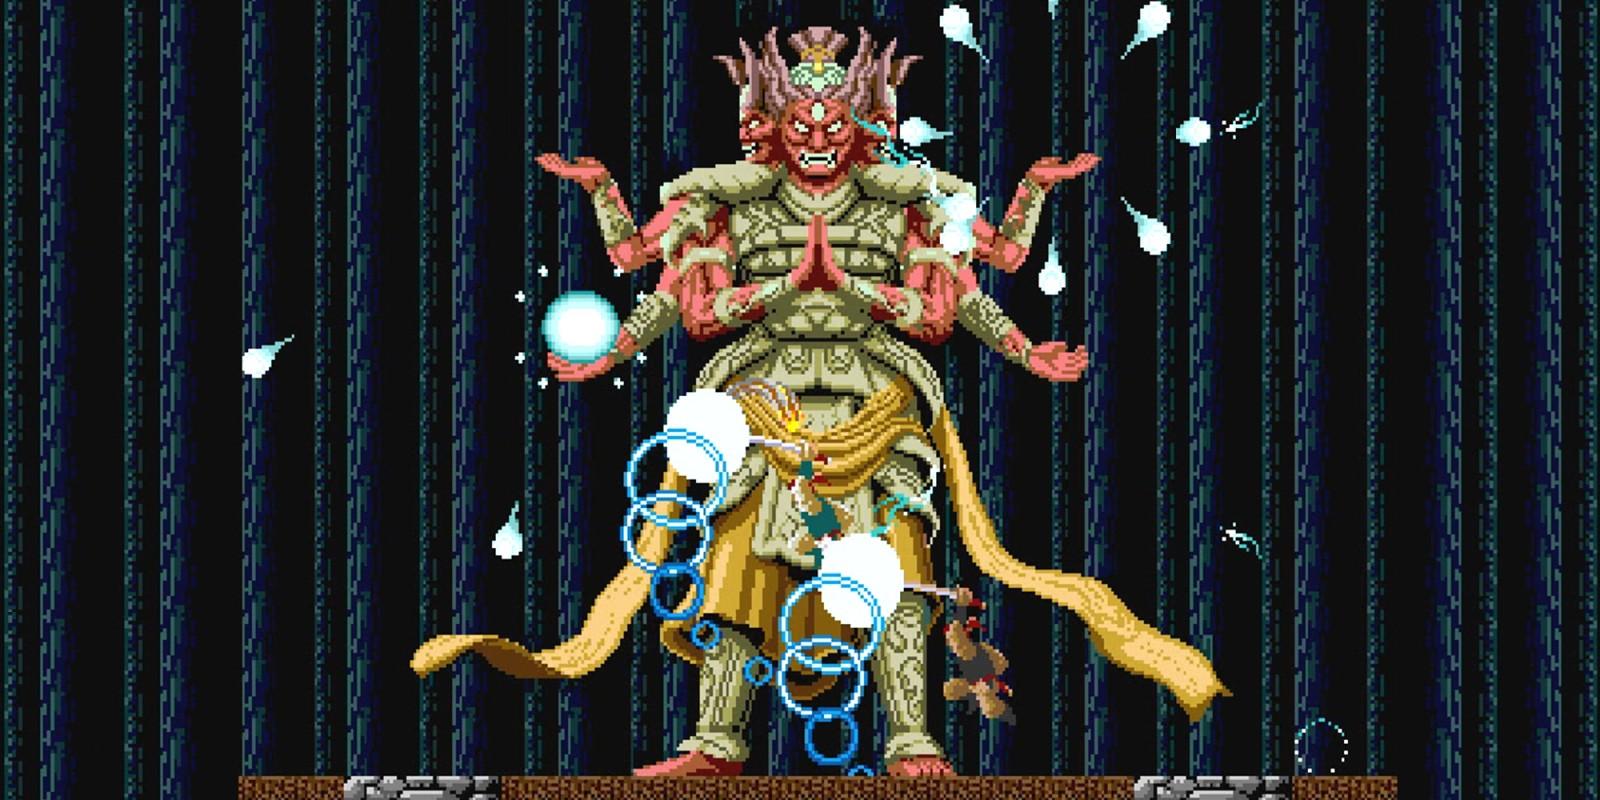 Videojuegos V1.3  - Página 10 H2x1_WiiUVC_NinjaSpirit_image1600w